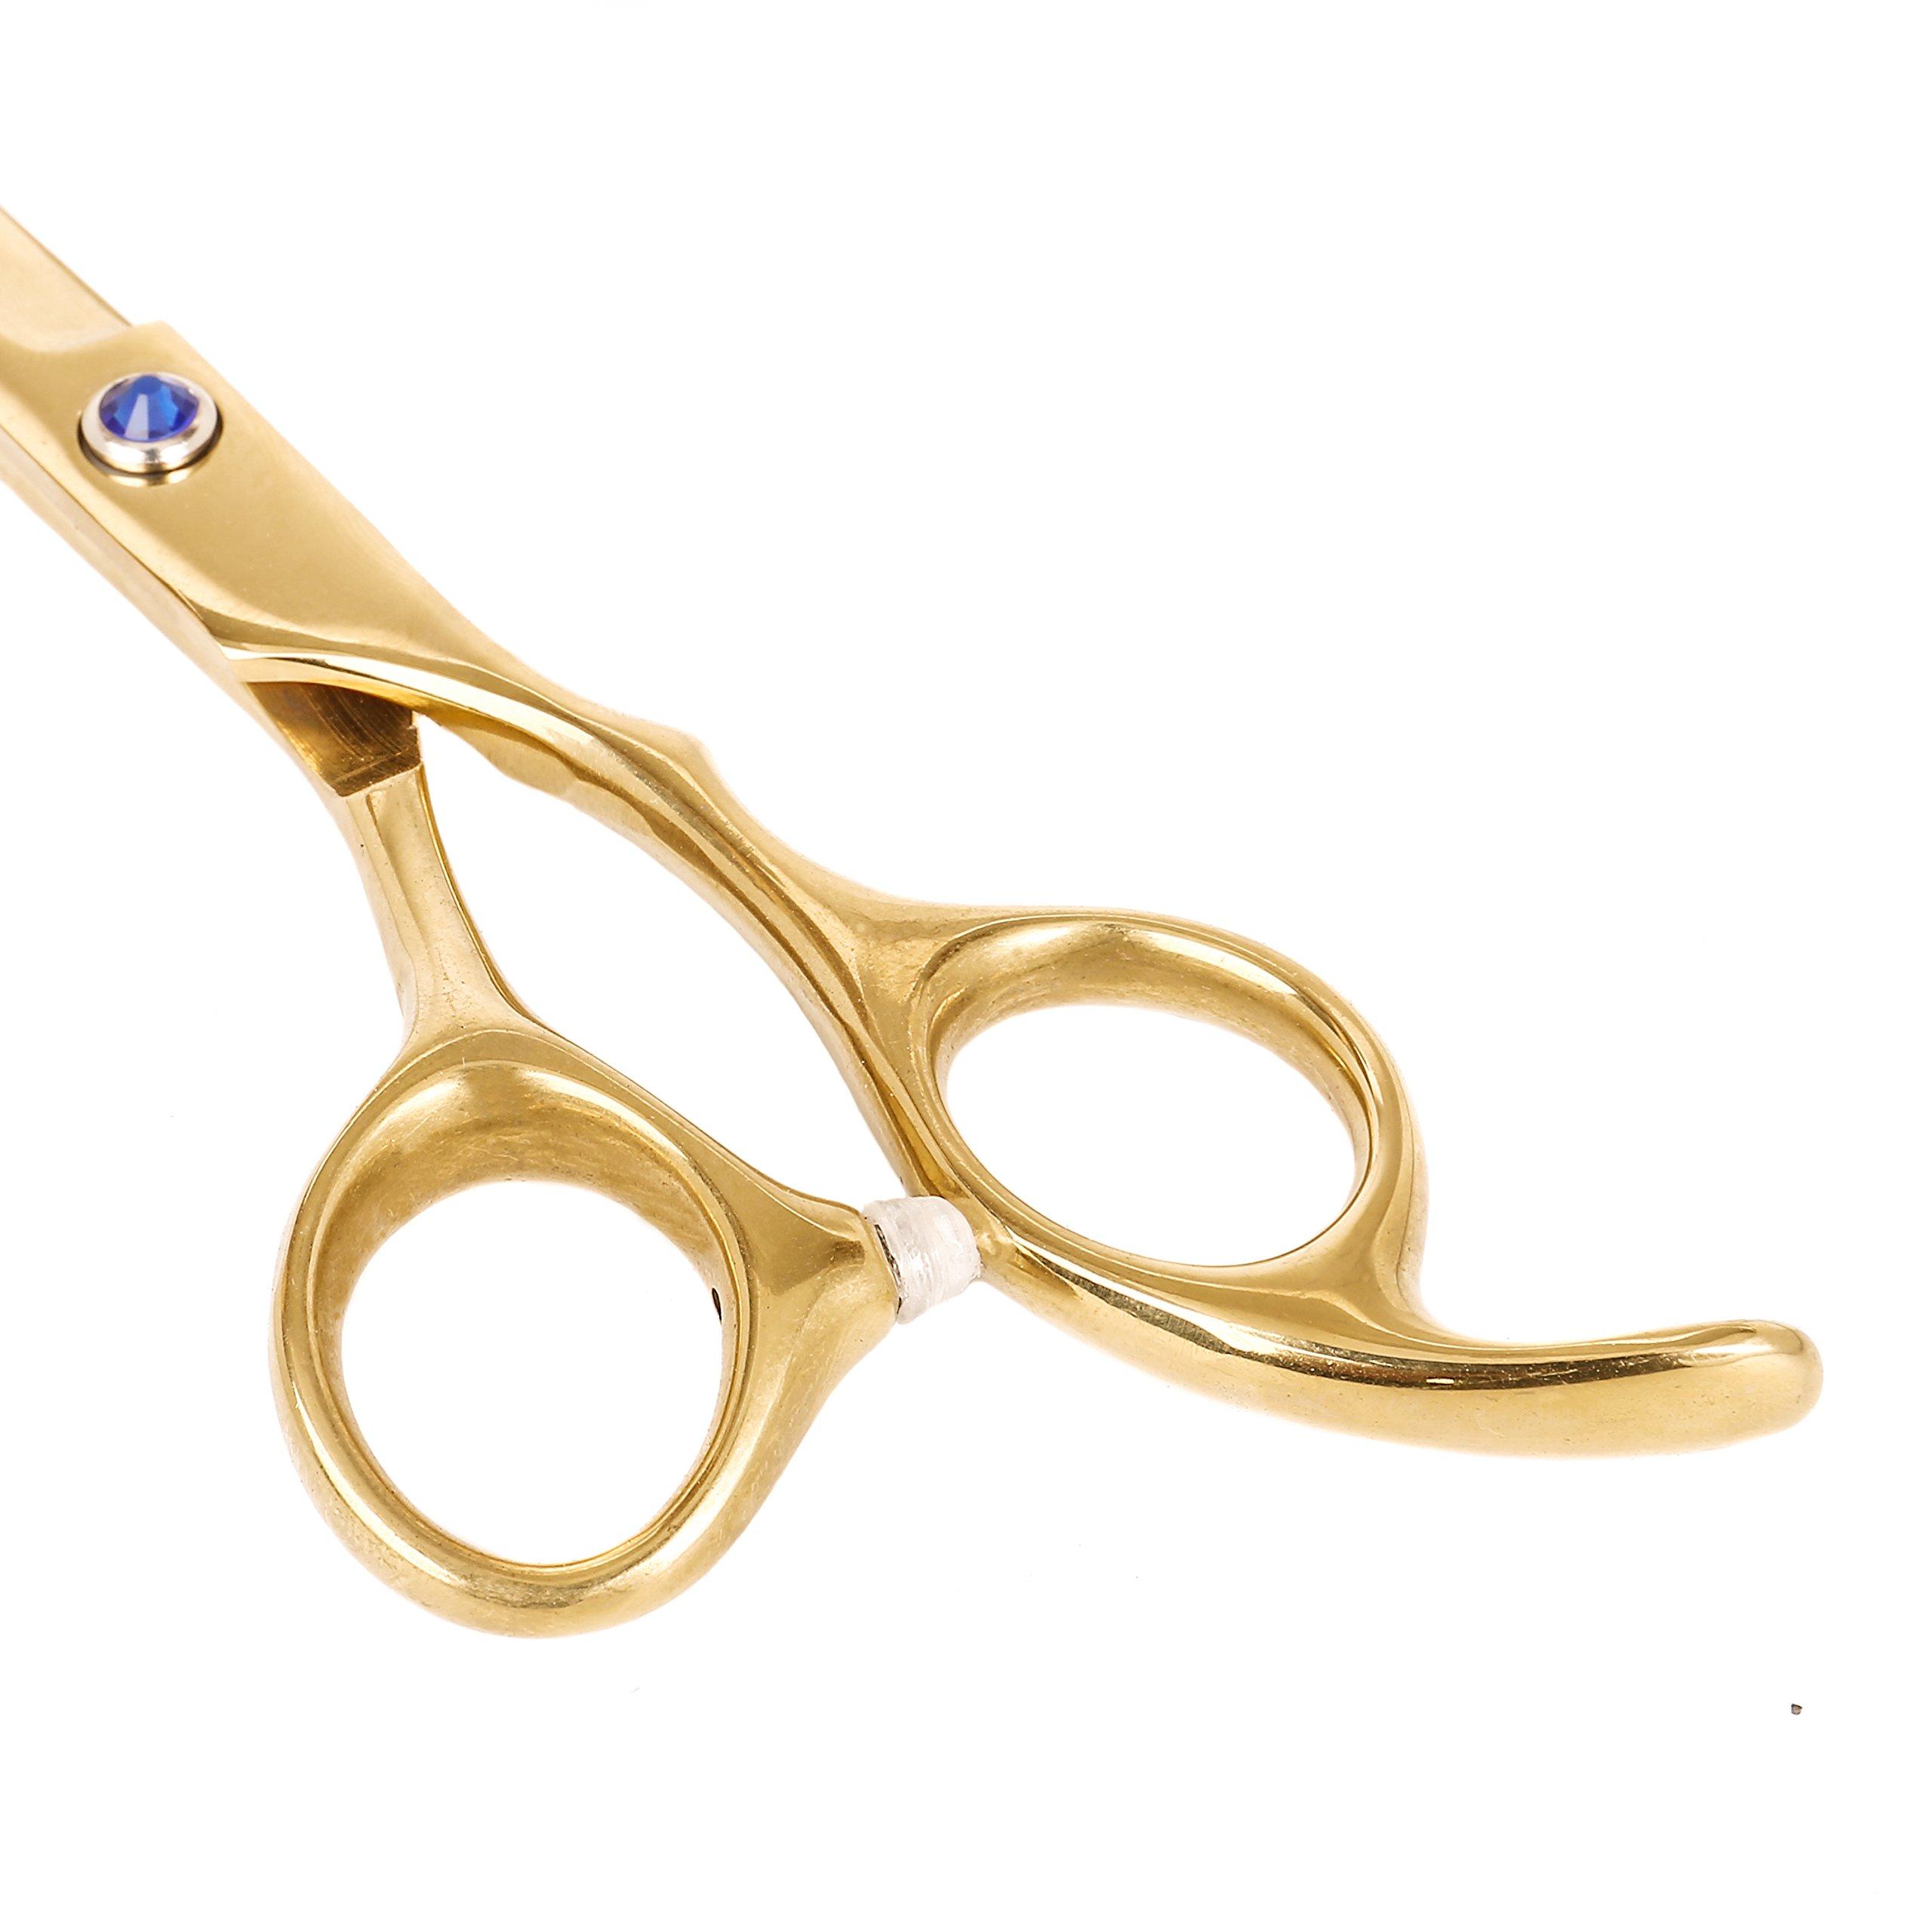 2018 Newest Hair Cutting Scissors Shears Professional Barber Hairdressing Scissors Hair Straight Sharp Scissors With Fine Adjustment Tension Screw Salon Razor Edge Scissors For Women/Men 6.5 Inch gold by JAVEN (Image #4)